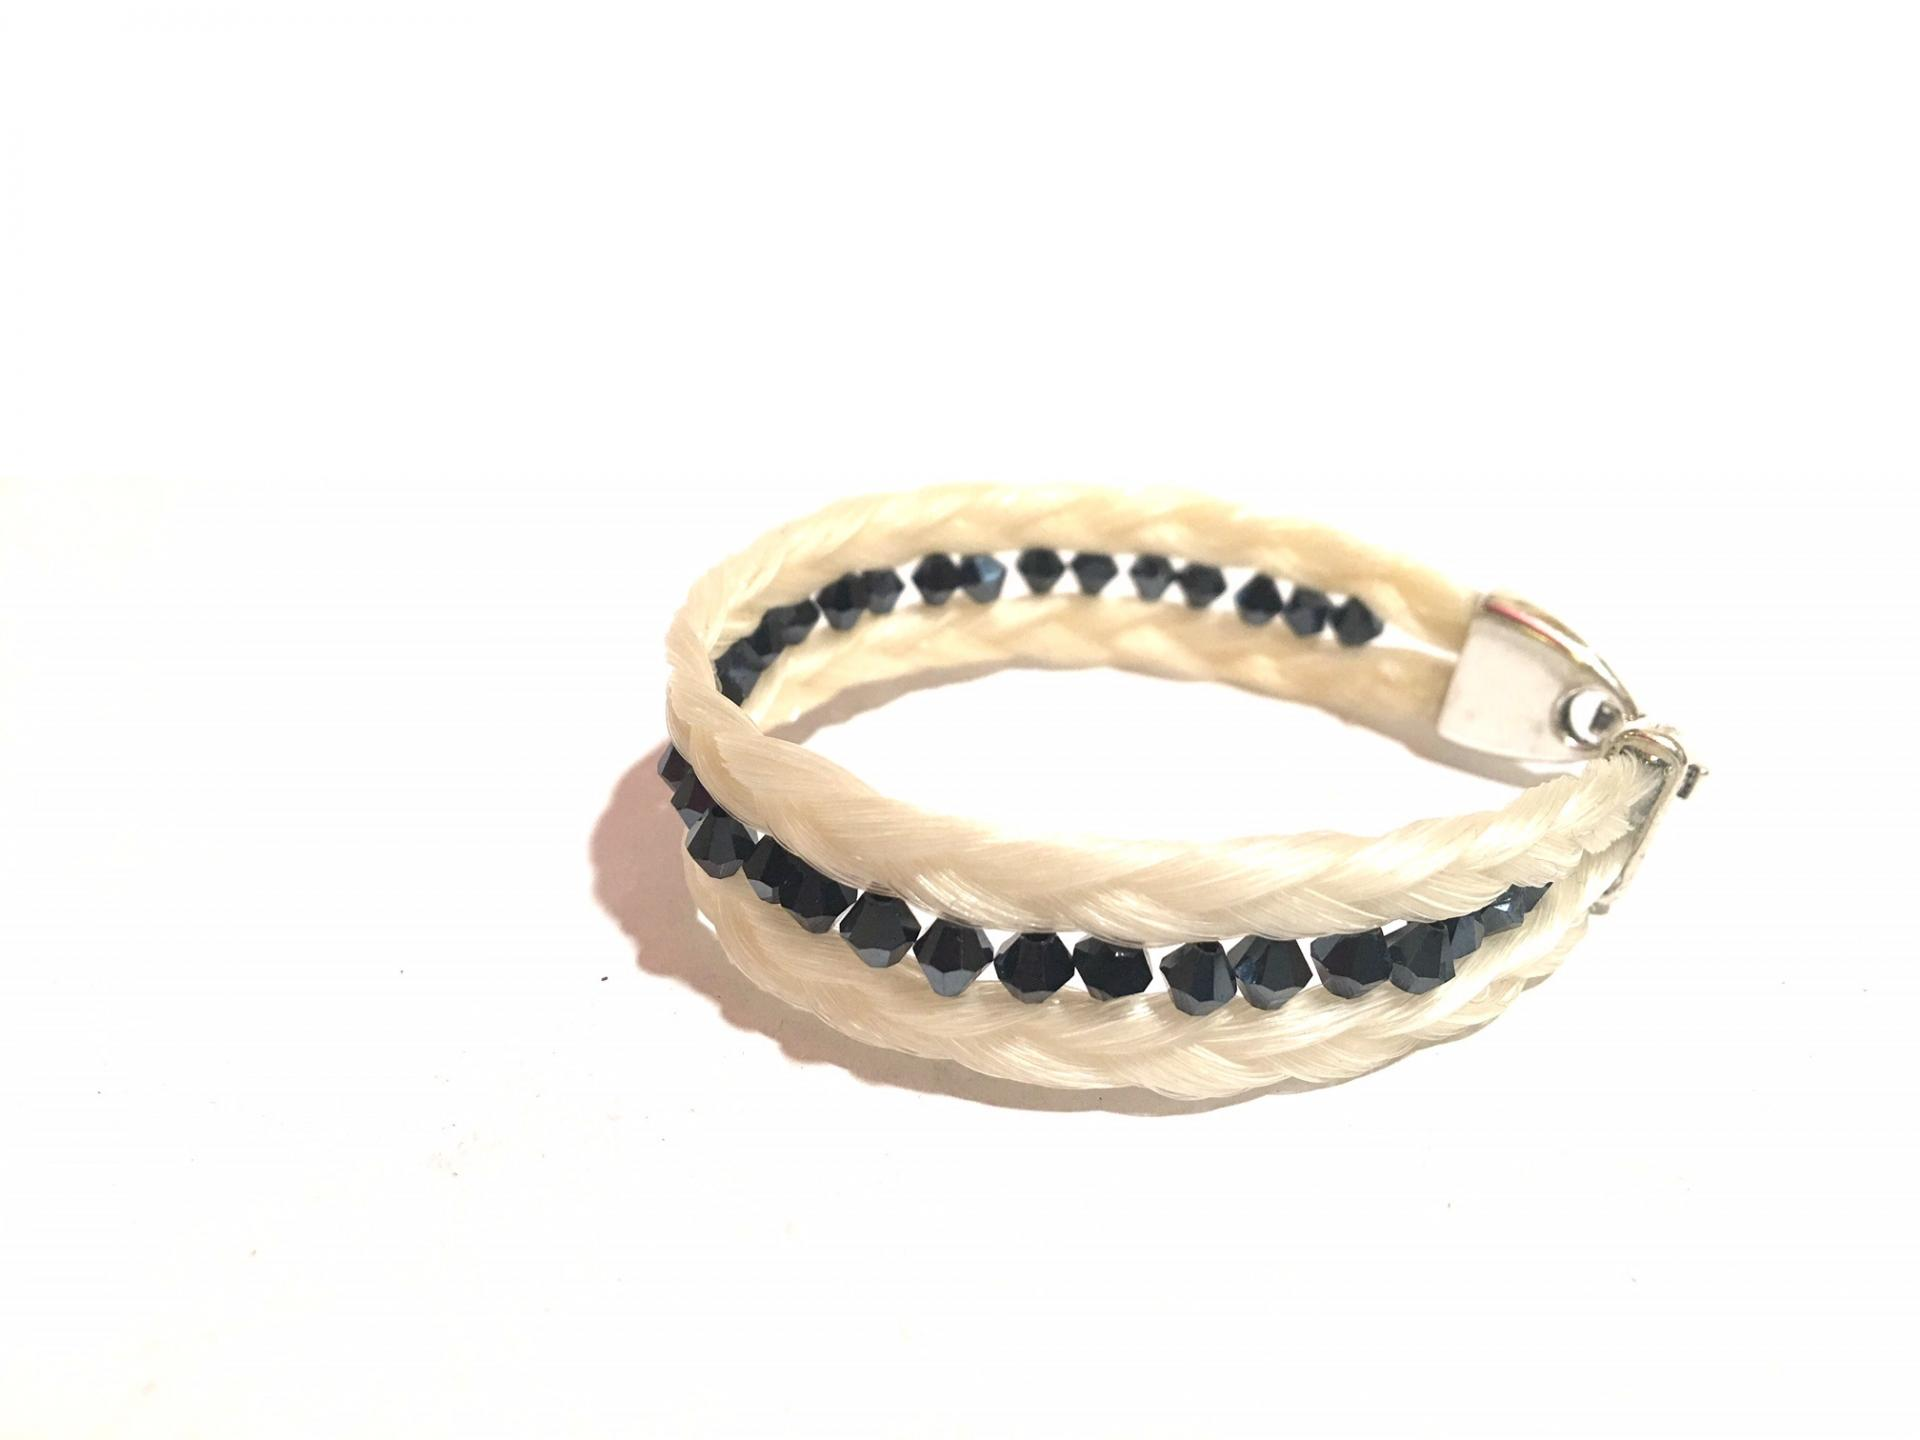 Creation crins cheval bijoux bracelet perle swaroski noir fermoir argent plat montre